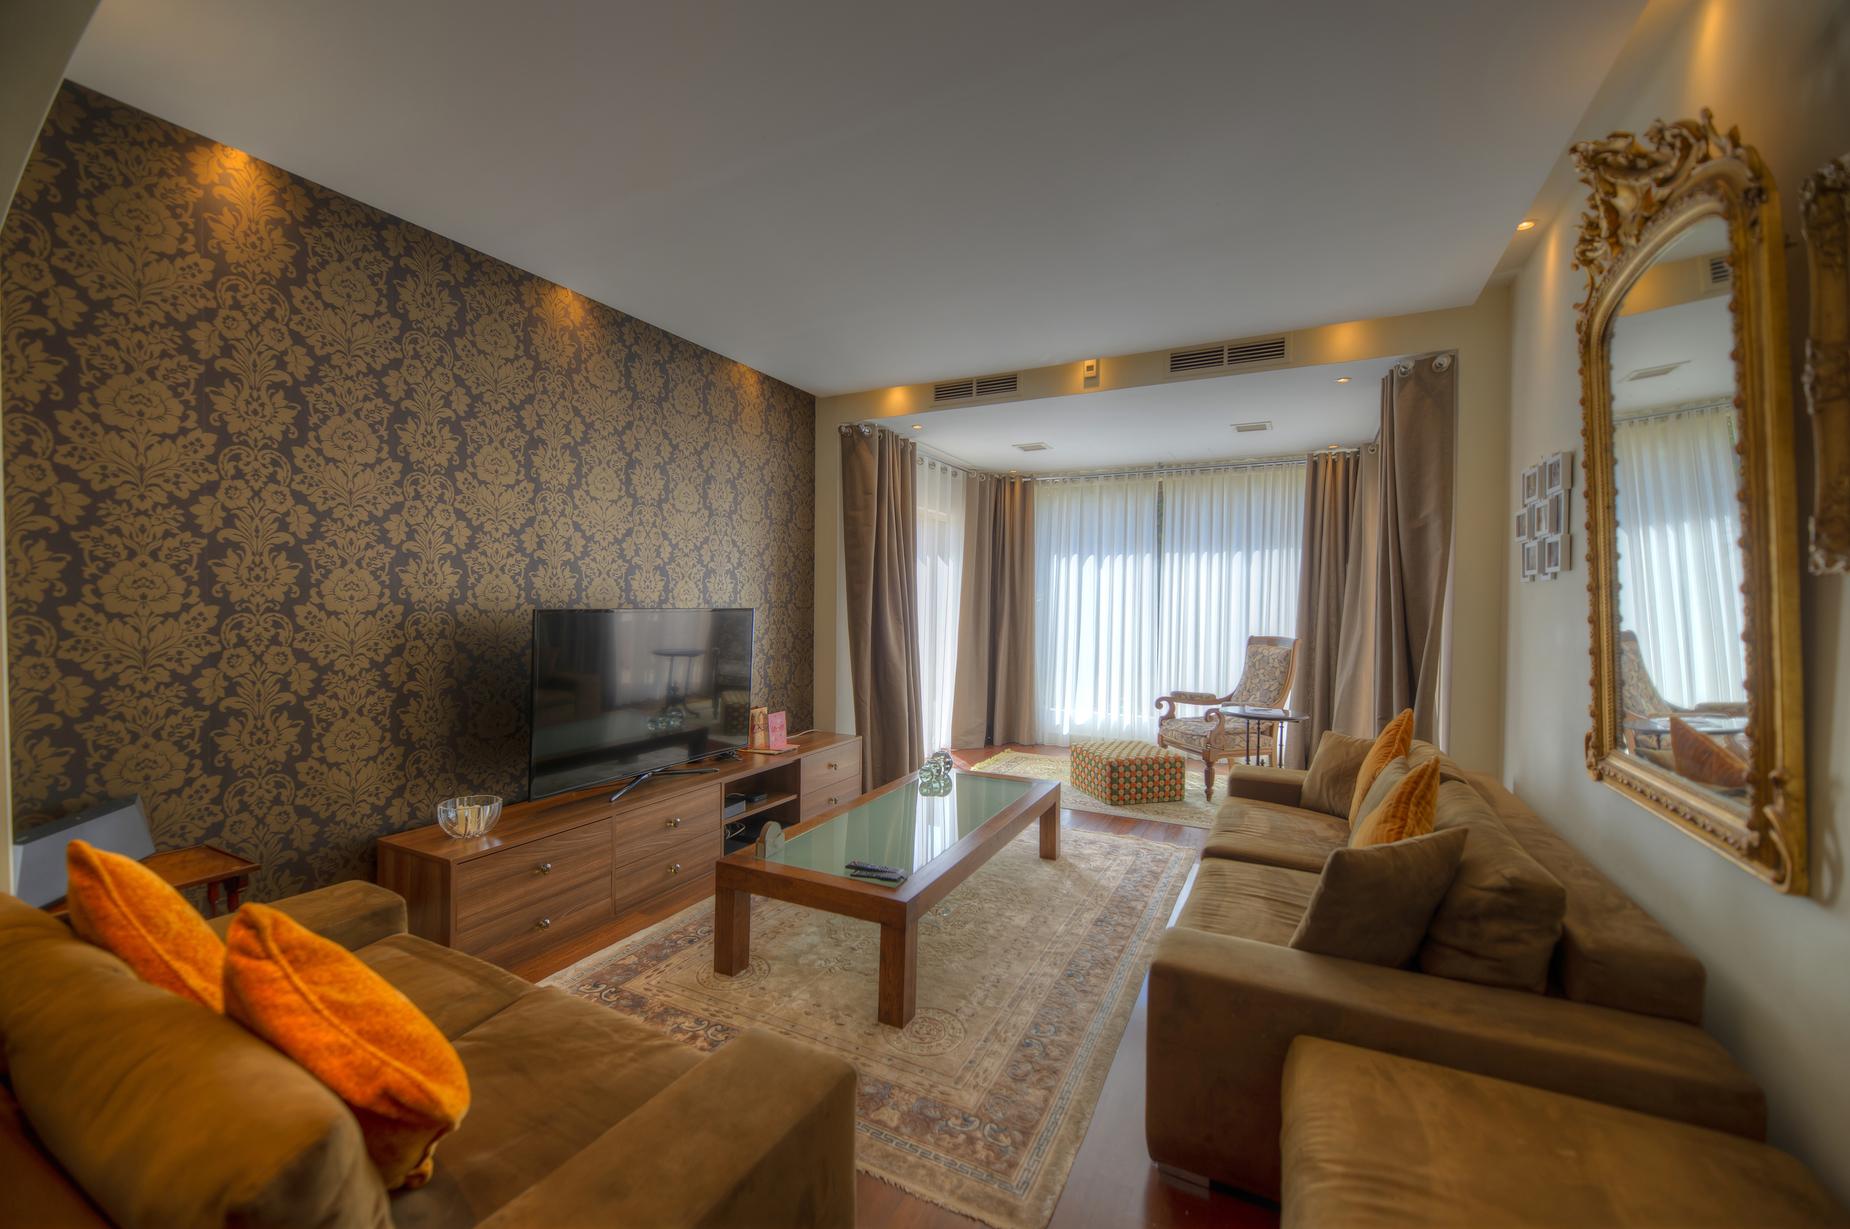 4 bed Villa For Rent in Iklin, Iklin - thumb 15